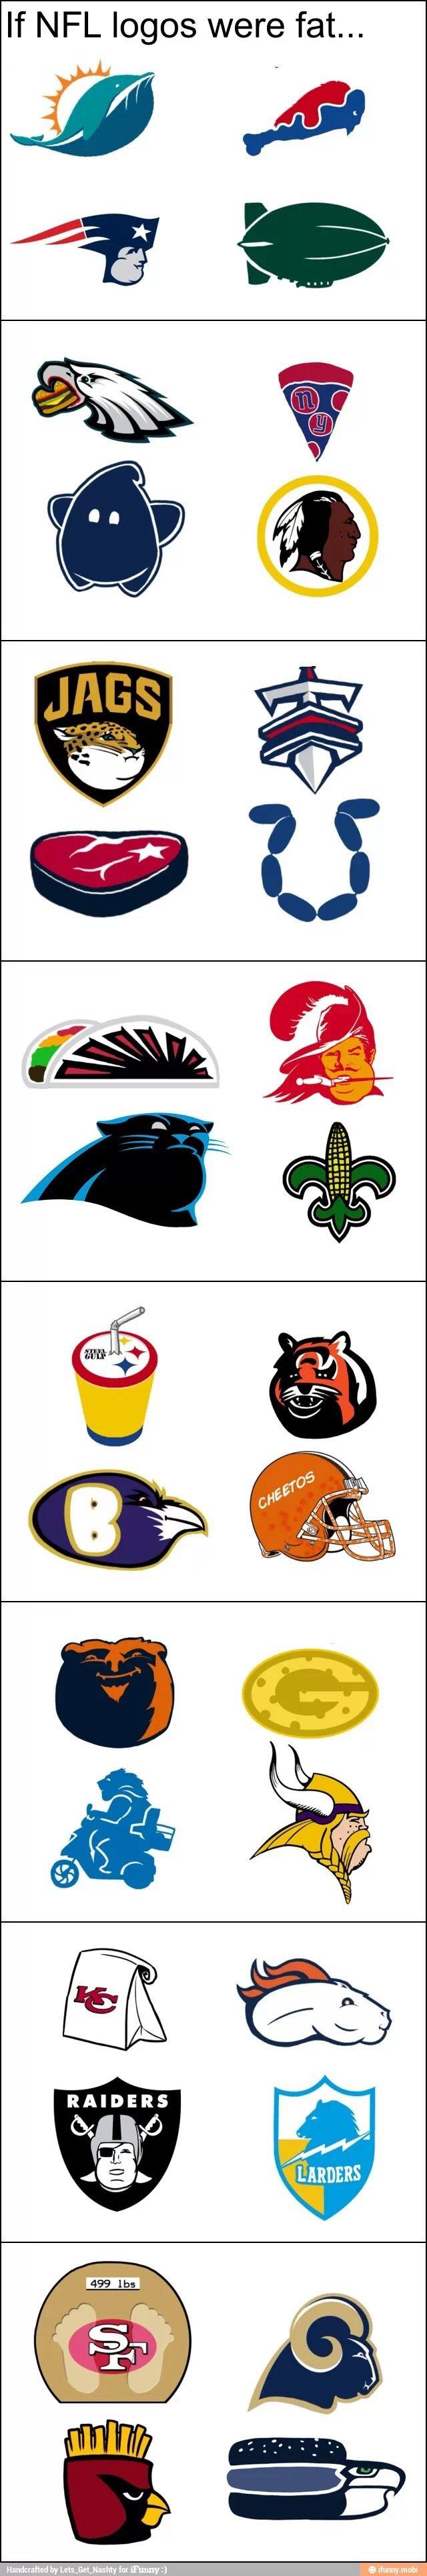 Fat football logos